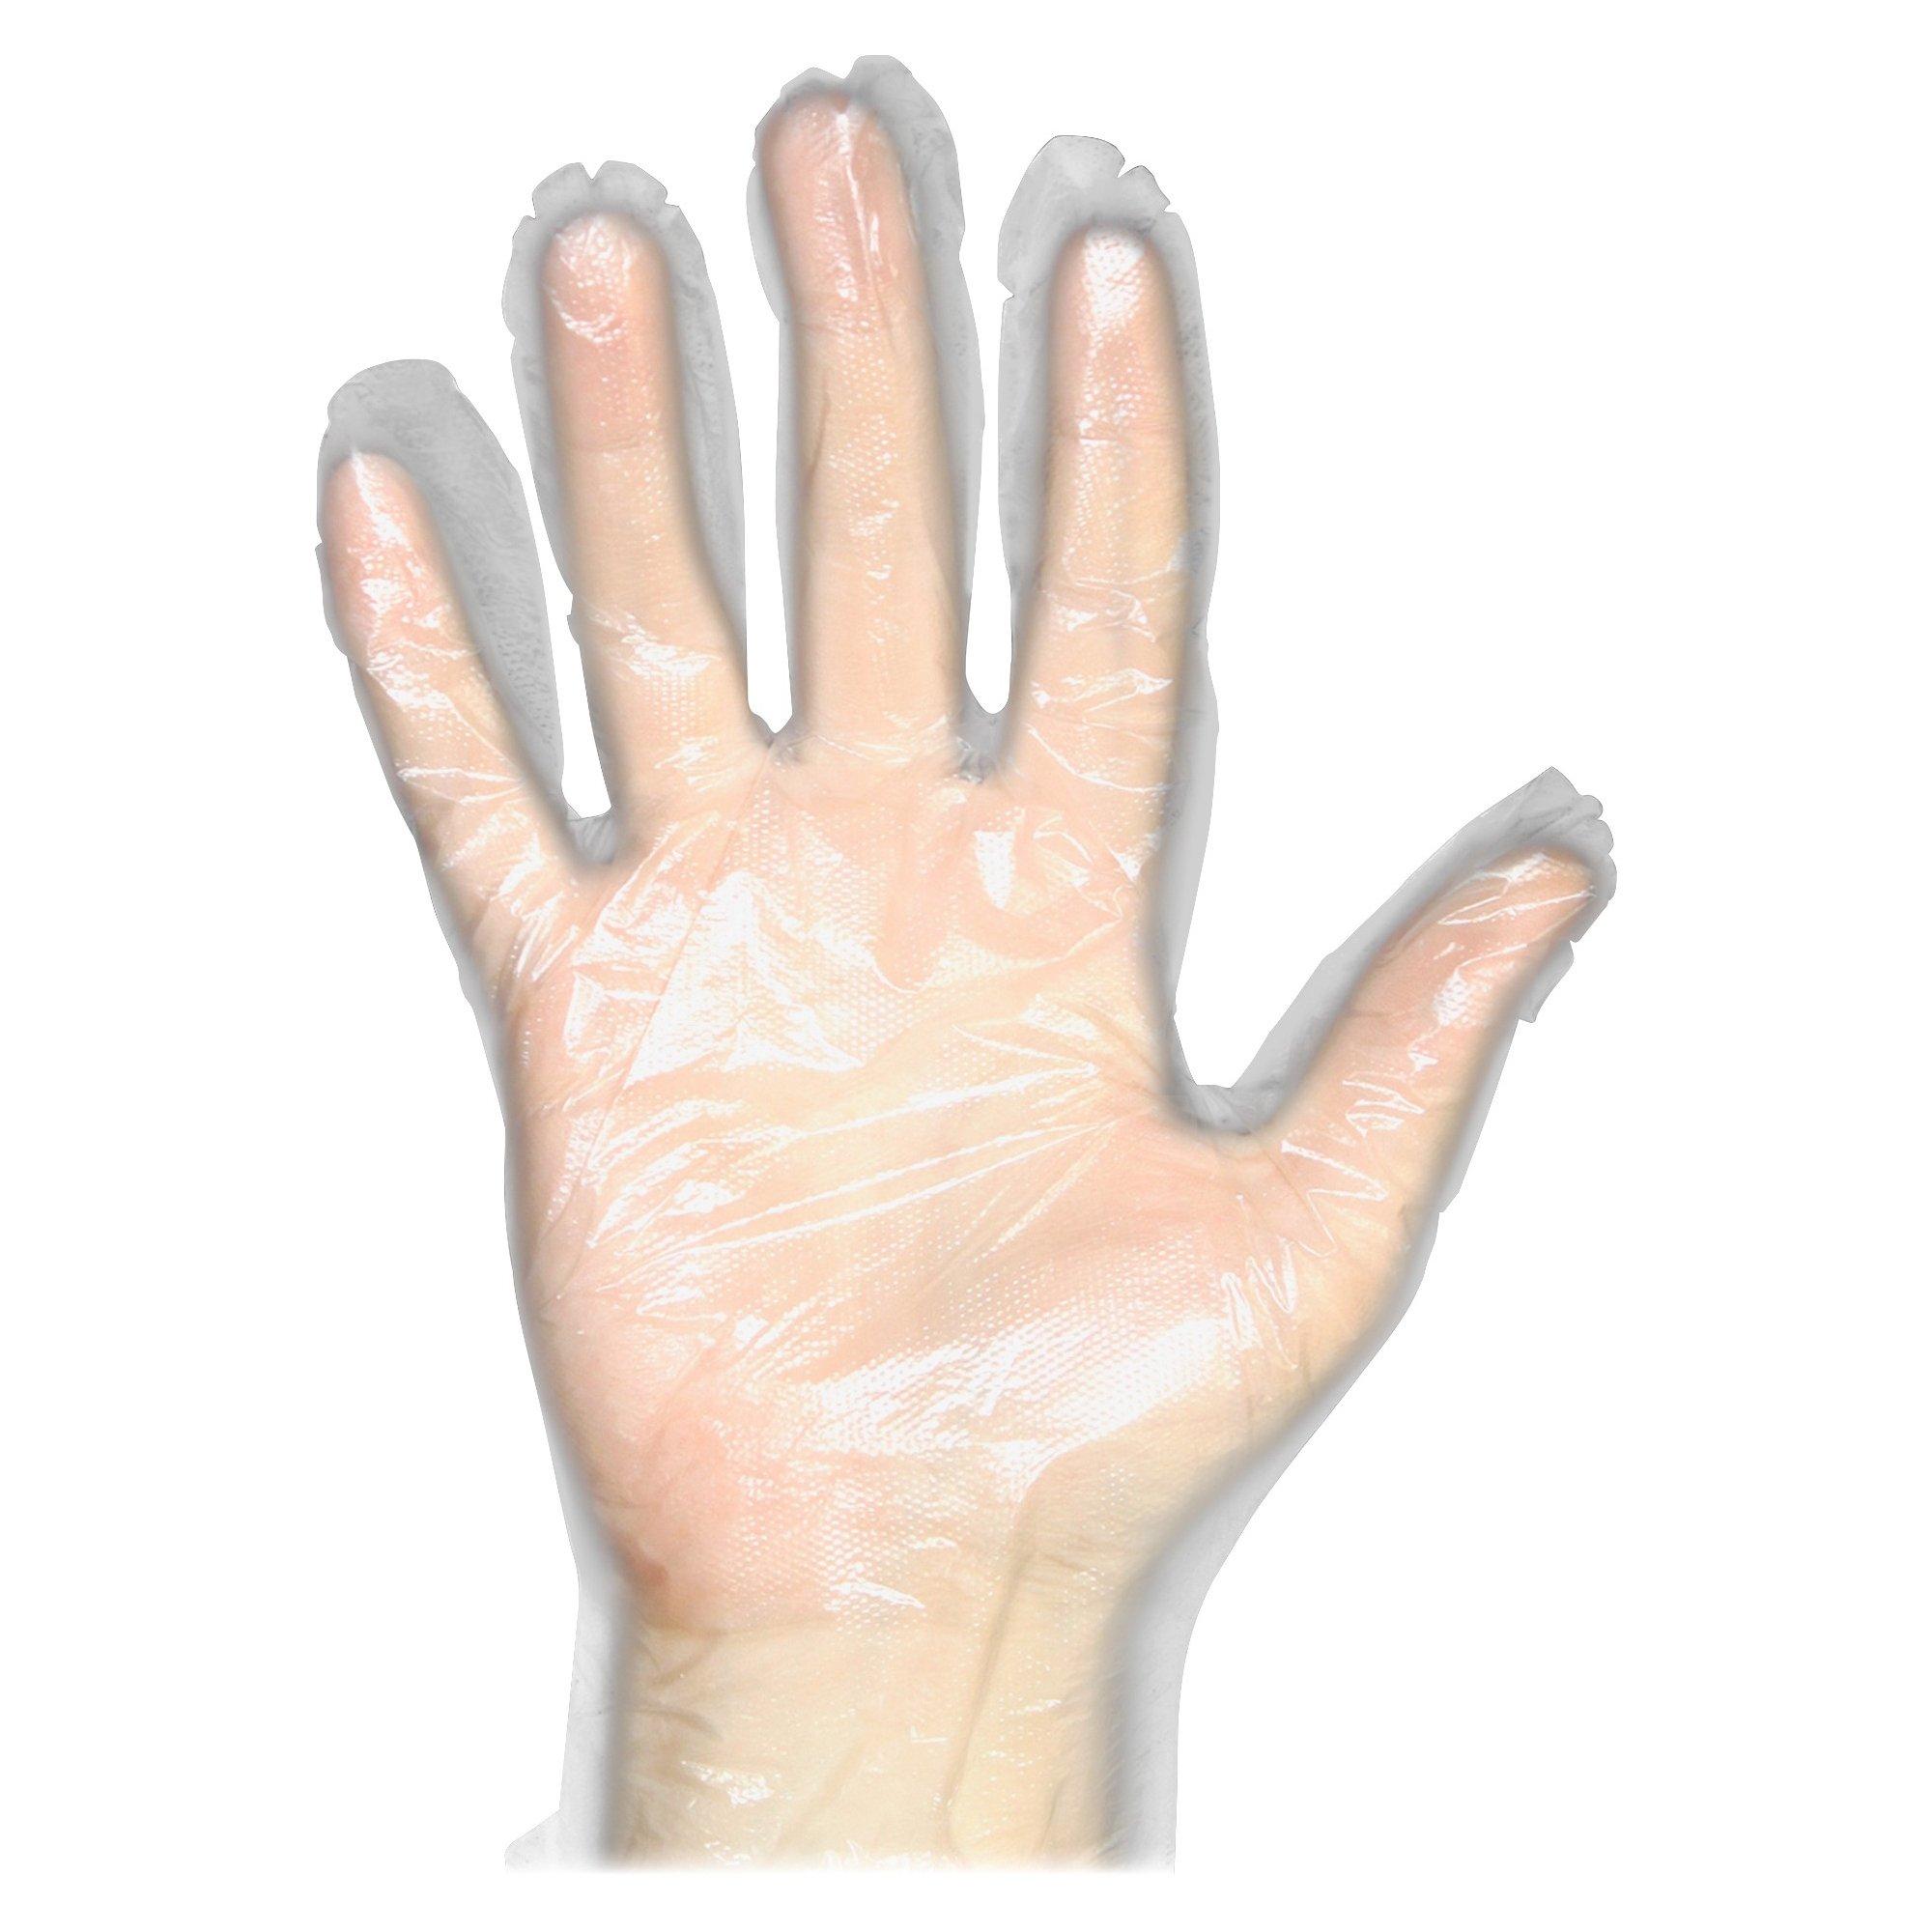 ProGuard Disposable Clear General Purpose Gloves - Medium Size - Disposable, Comfortable, Durable, Ambidextrous, Lightweight - Polyethylene - 1000 / Carton - Clear